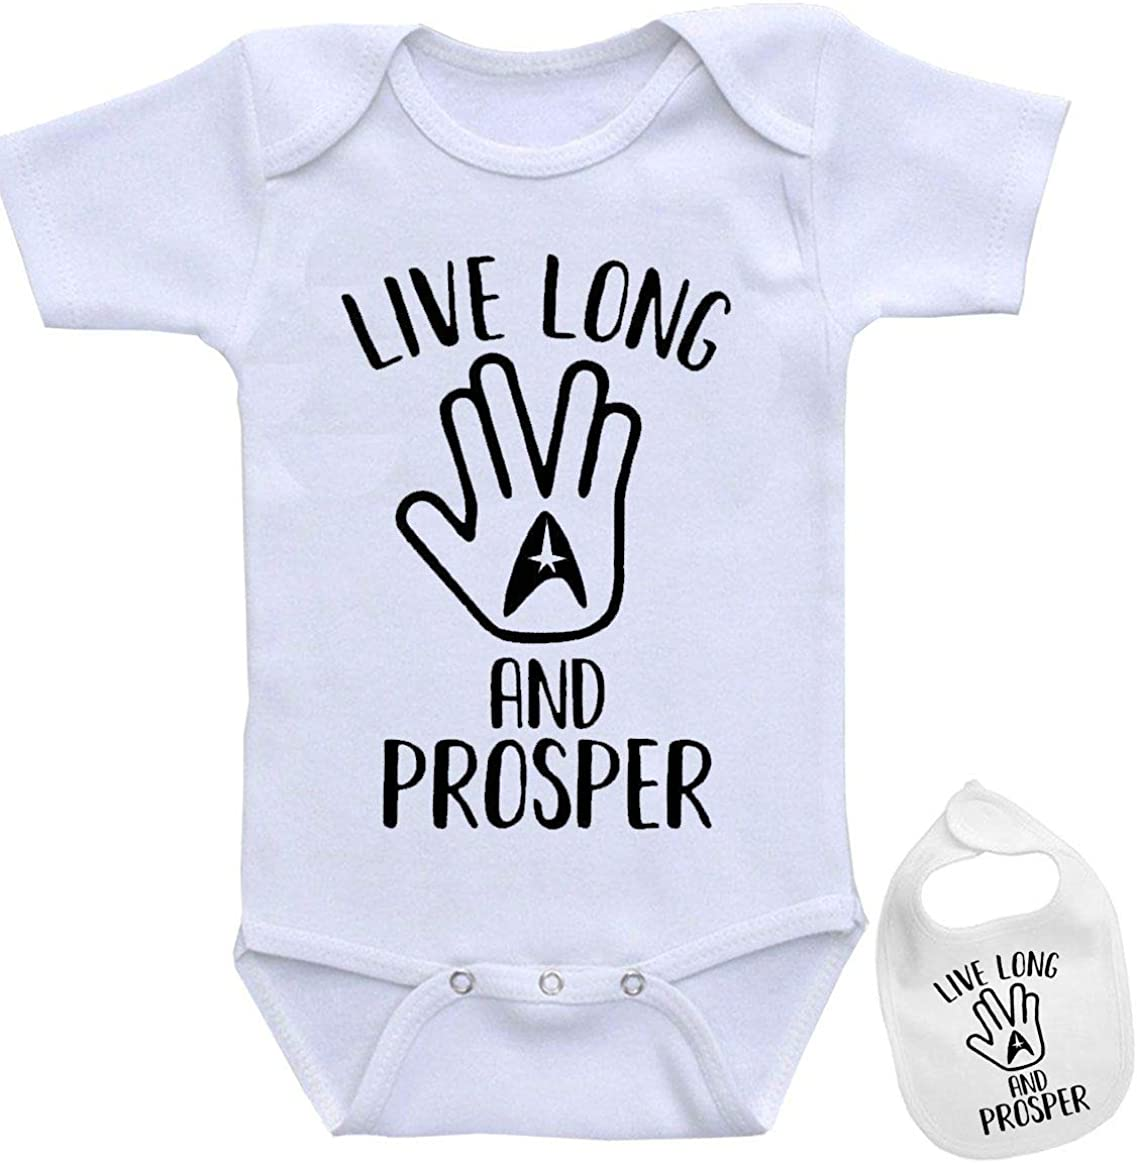 Star Trek Spock -Cute Nerdy Saying Funny Shirt Baby Bodysuit Outfit Onesie & Bib